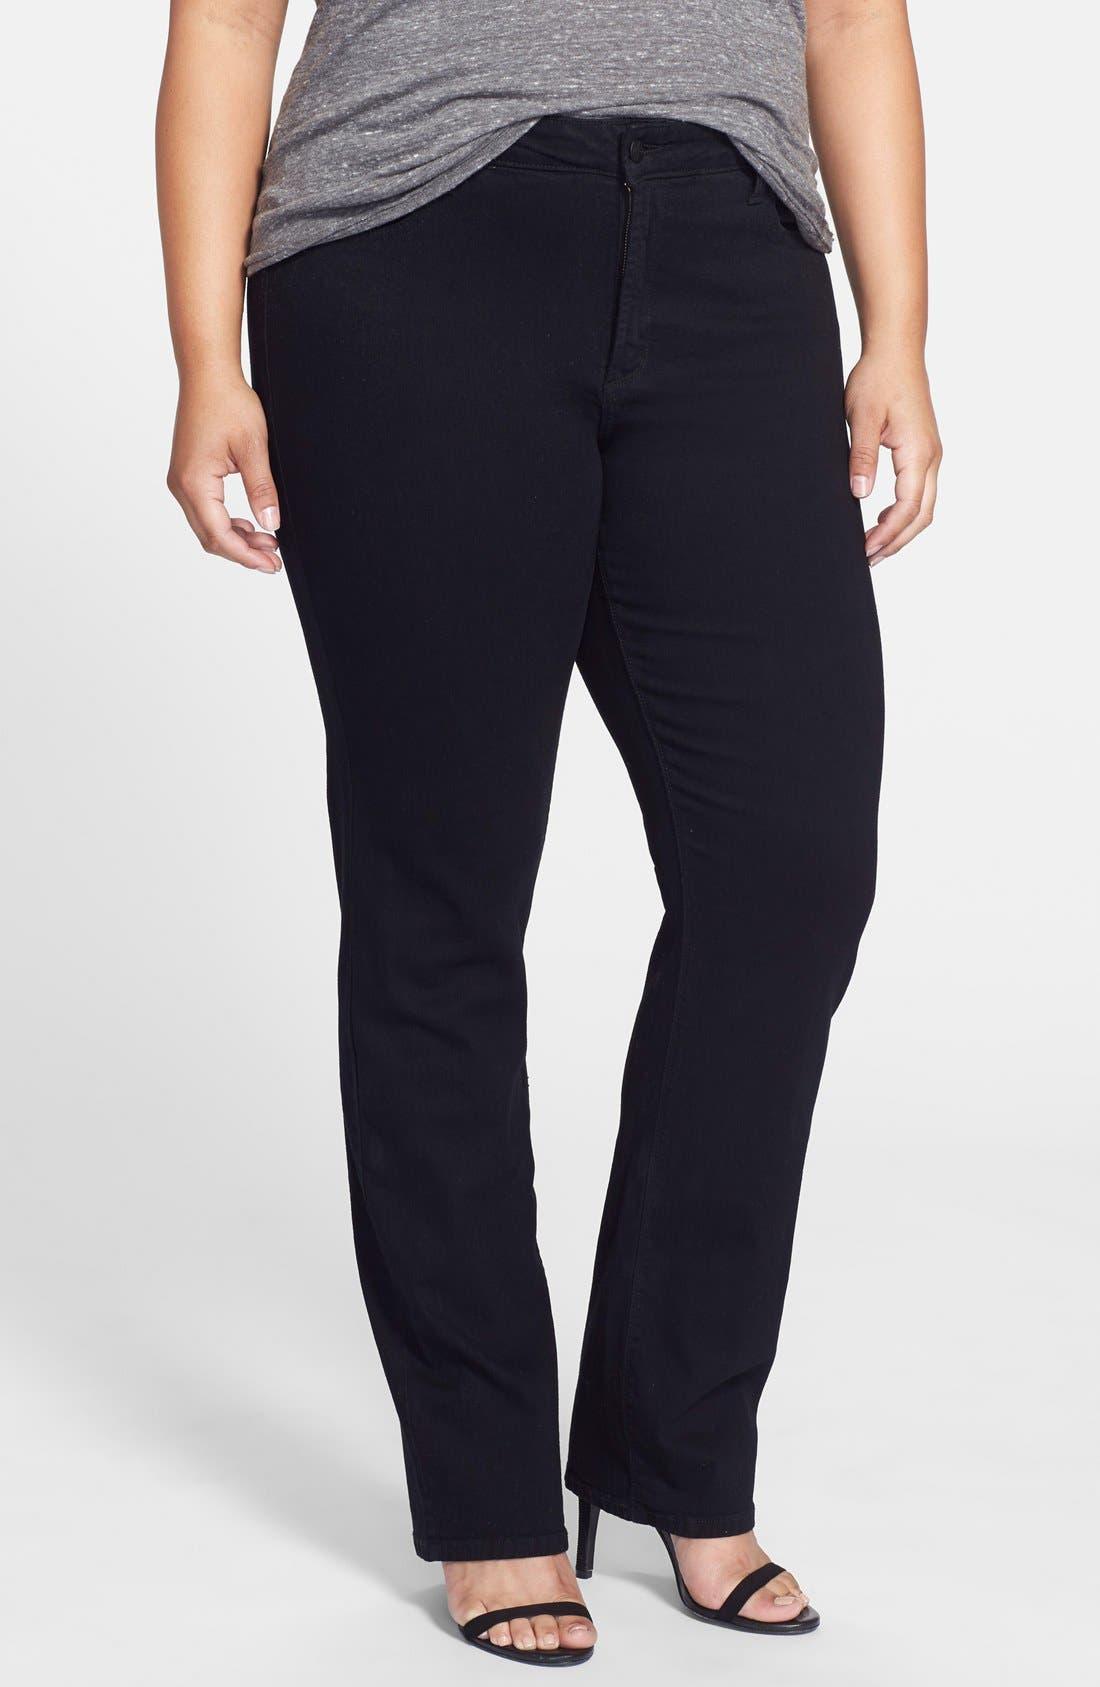 Alternate Image 1 Selected - NYDJ 'Marilyn' Stretch Straight Leg Jeans (Black) (Plus Size)